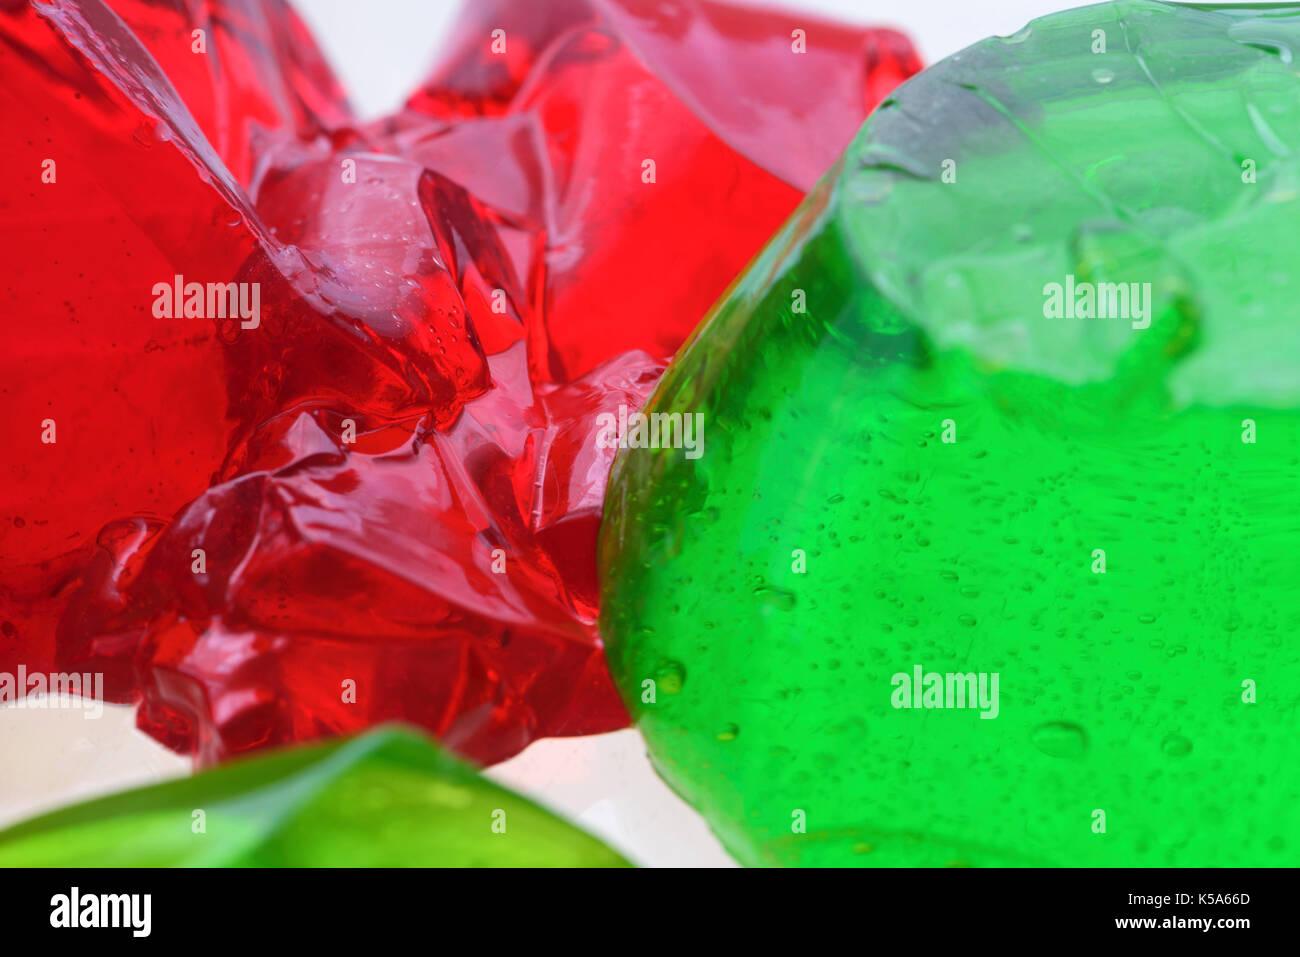 Abstract jello - Stock Image